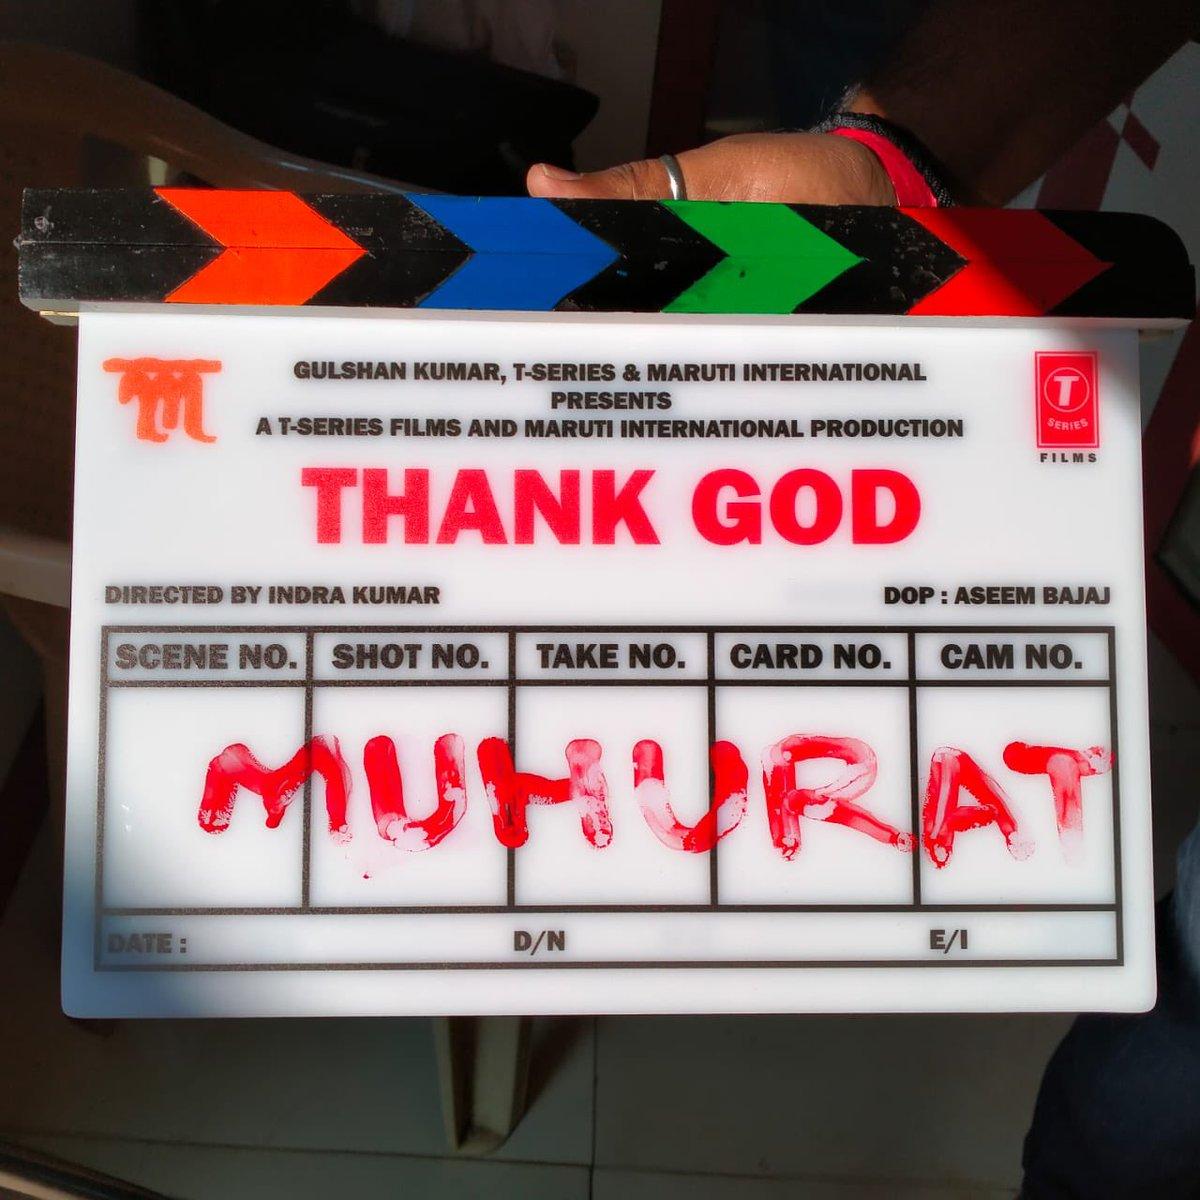 #ThankGod Shooting begins today. All the best to  @ajaydevgn @SidMalhotra @Rakulpreet  & entire team.